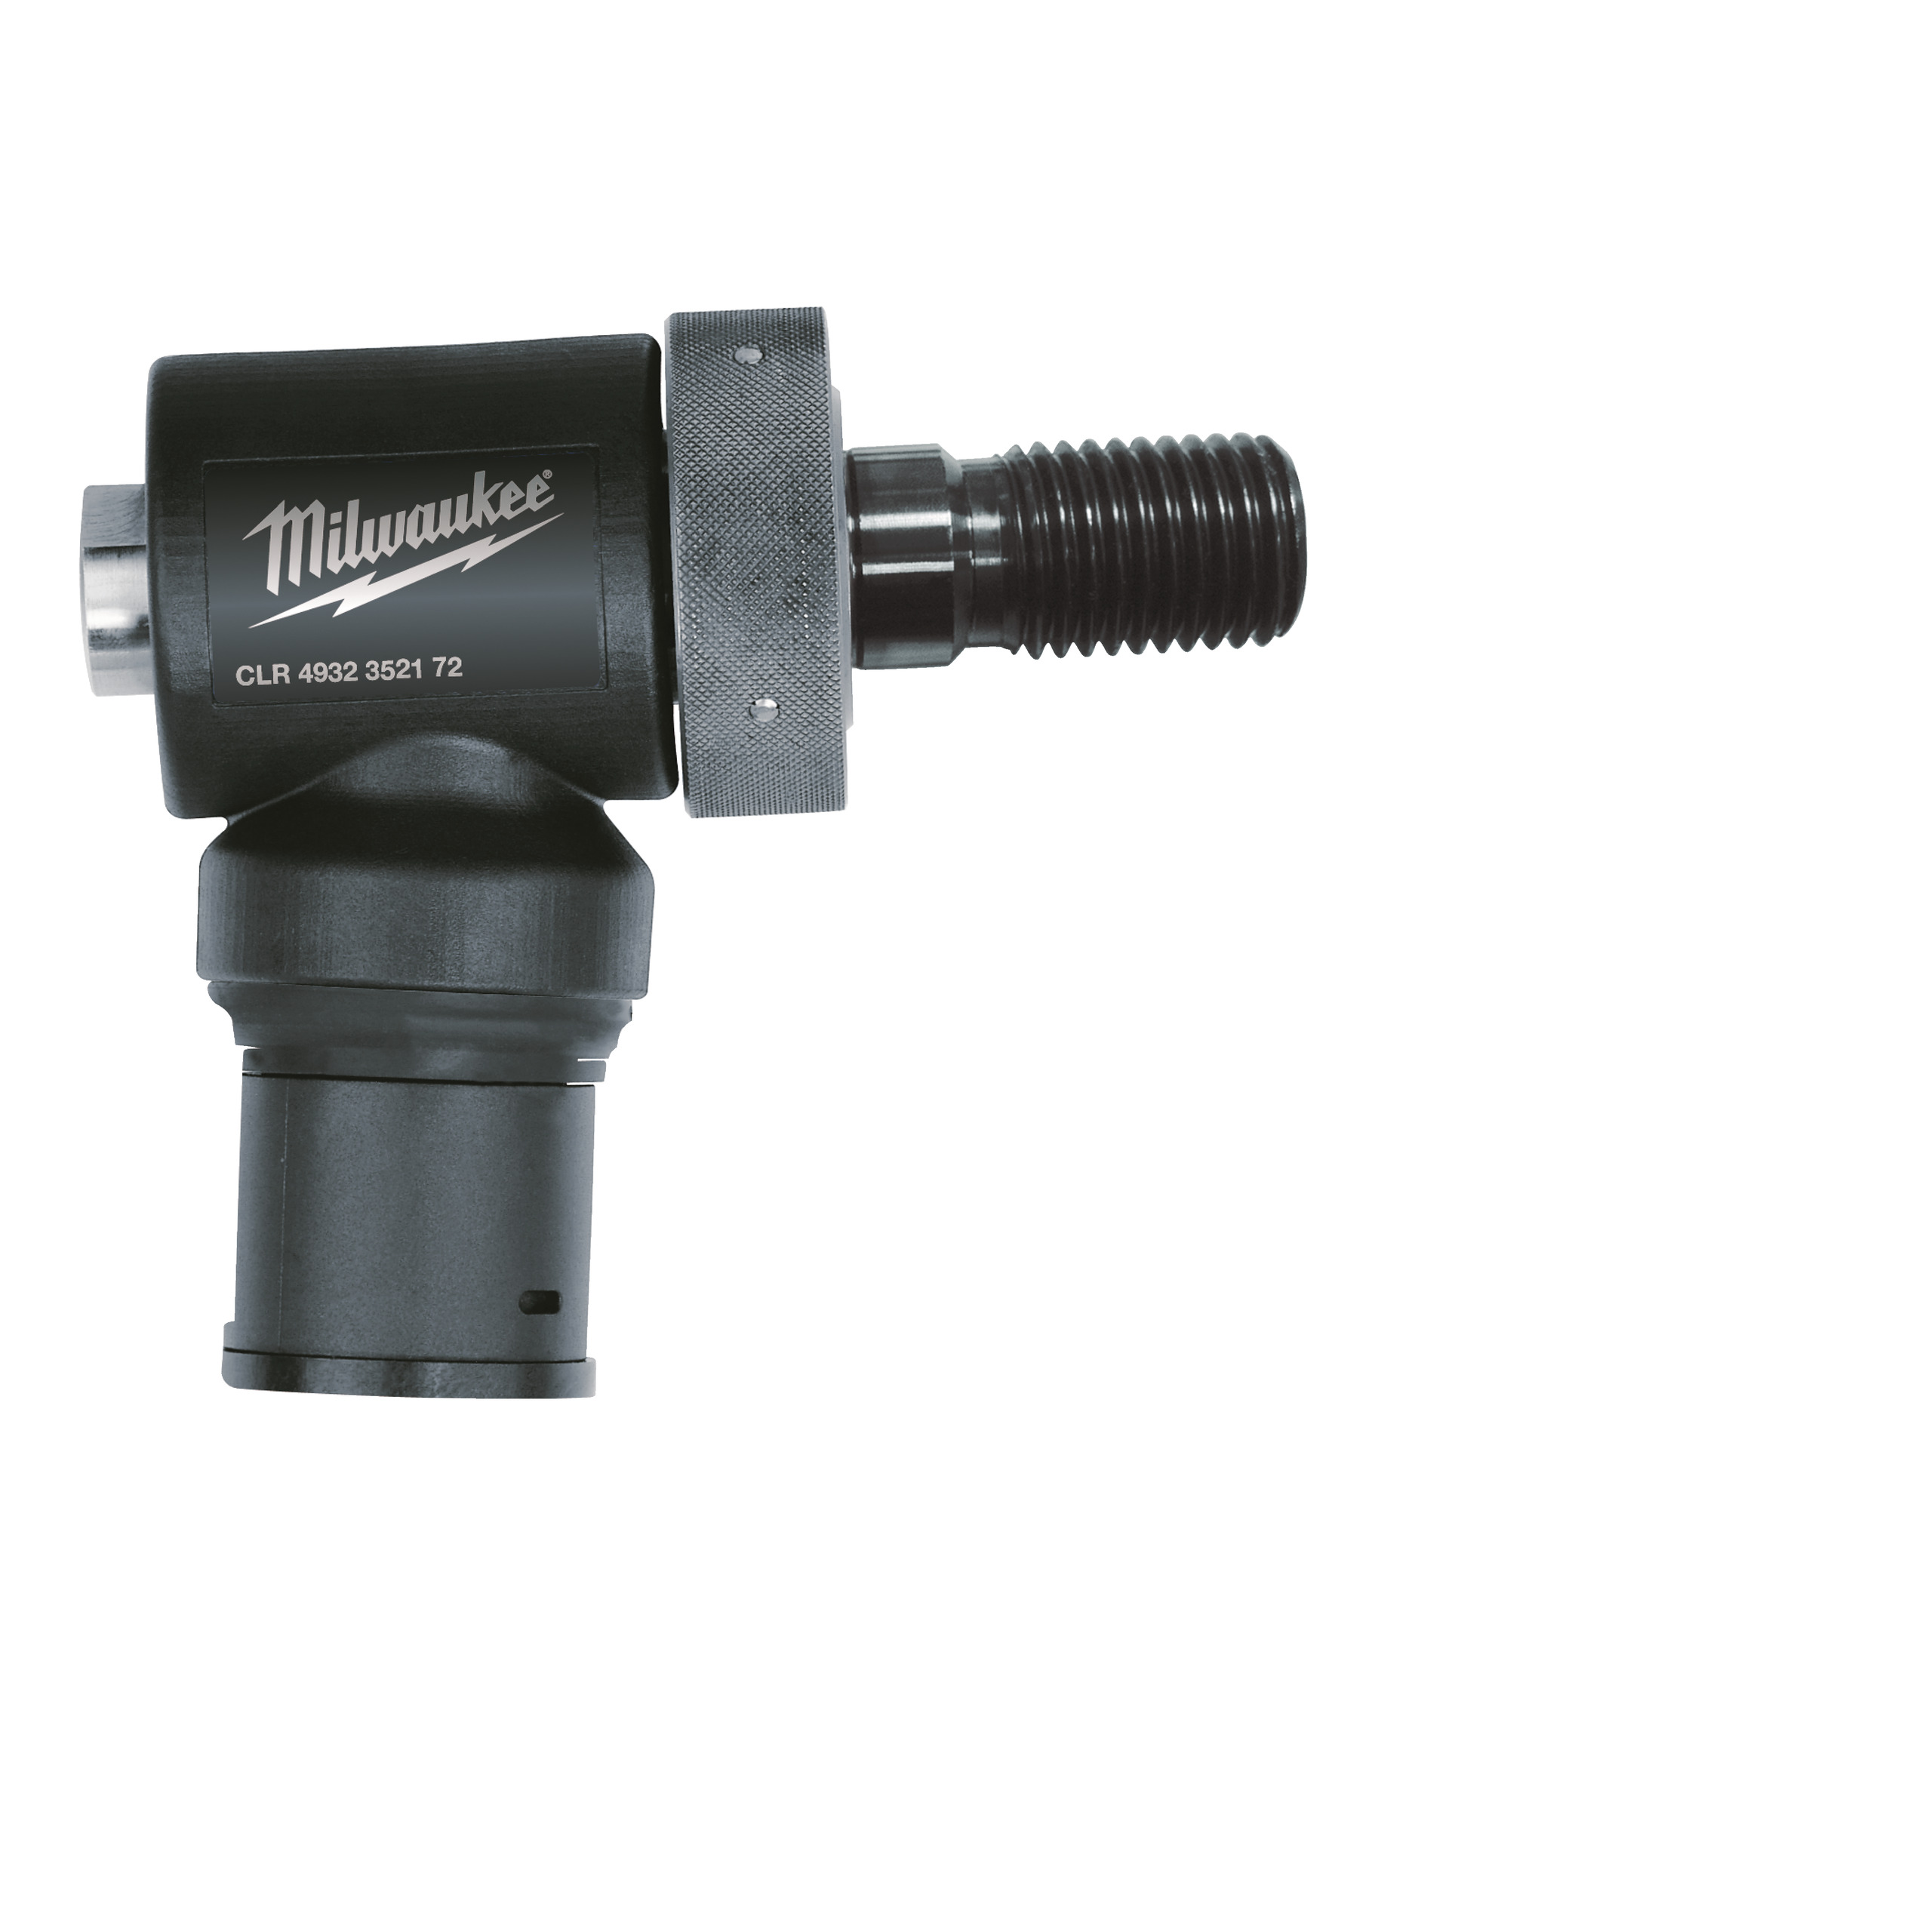 FIXTEC CleanLine Rotor 1 1/4 UNC, M18 x 2,5